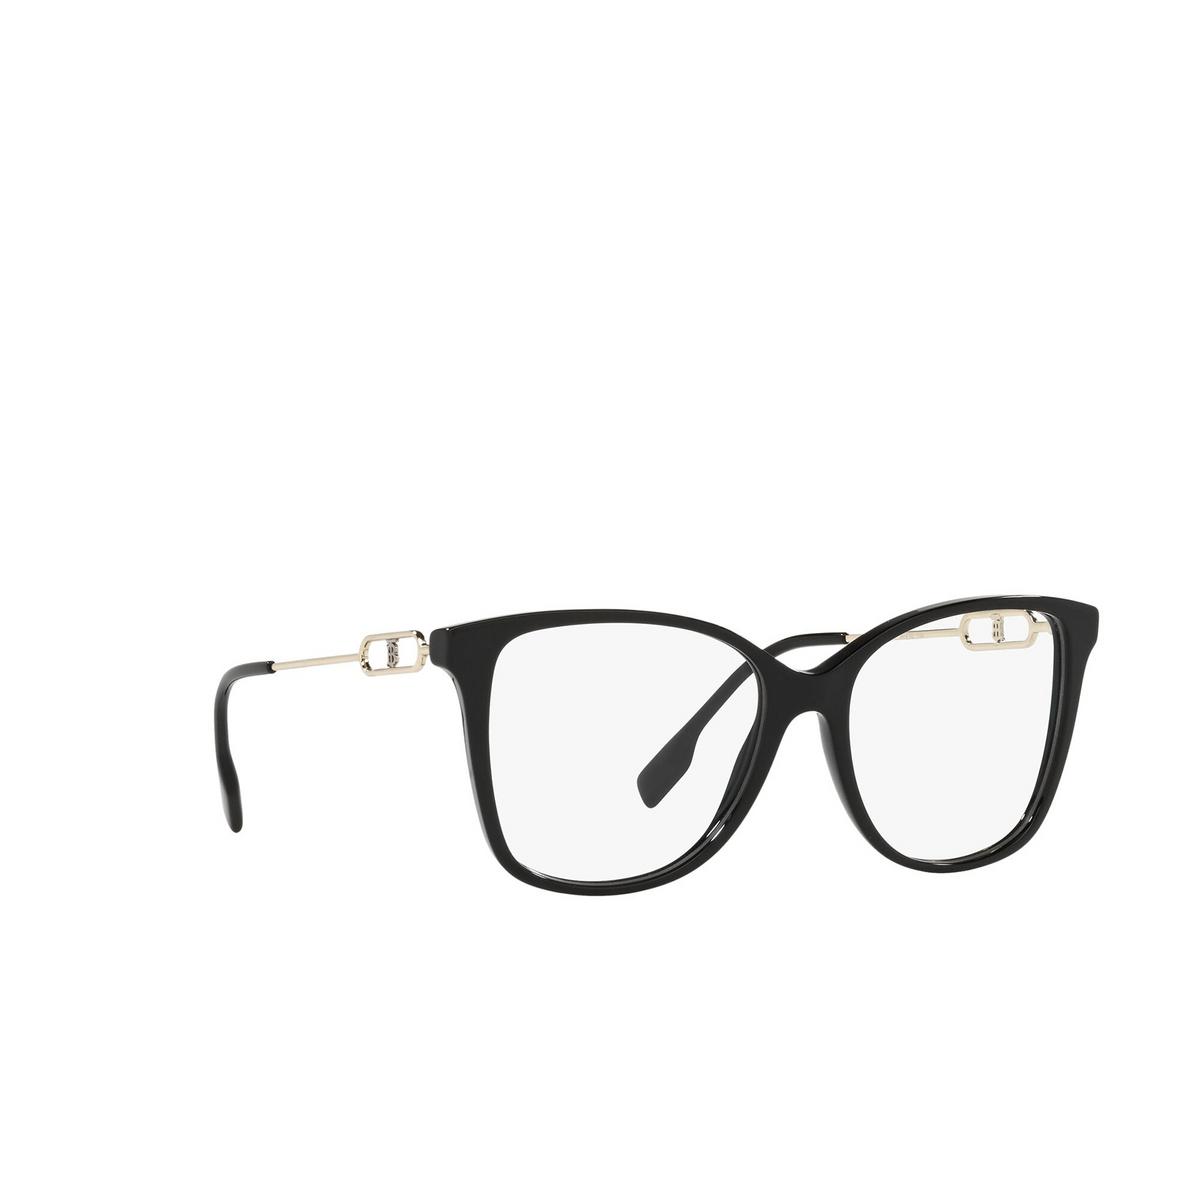 Burberry® Square Eyeglasses: Carol BE2336 color Black 3001 - three-quarters view.